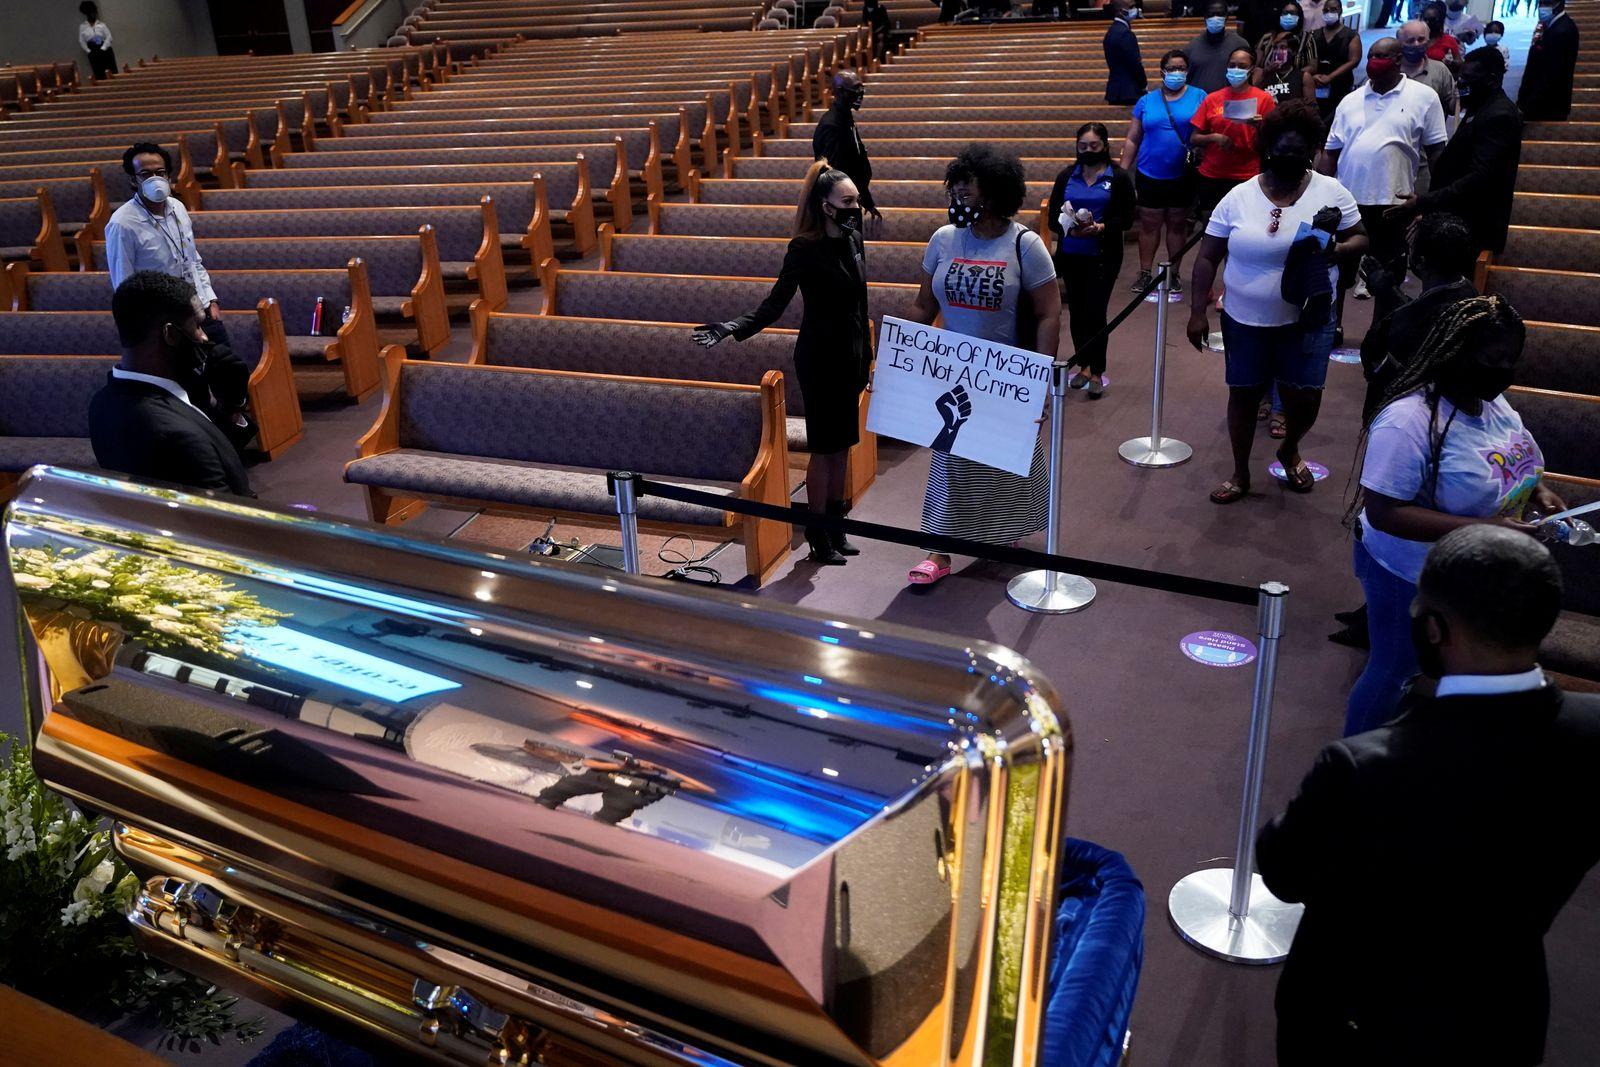 George Floyd public visitation at The Fountain of Praise church in Houston